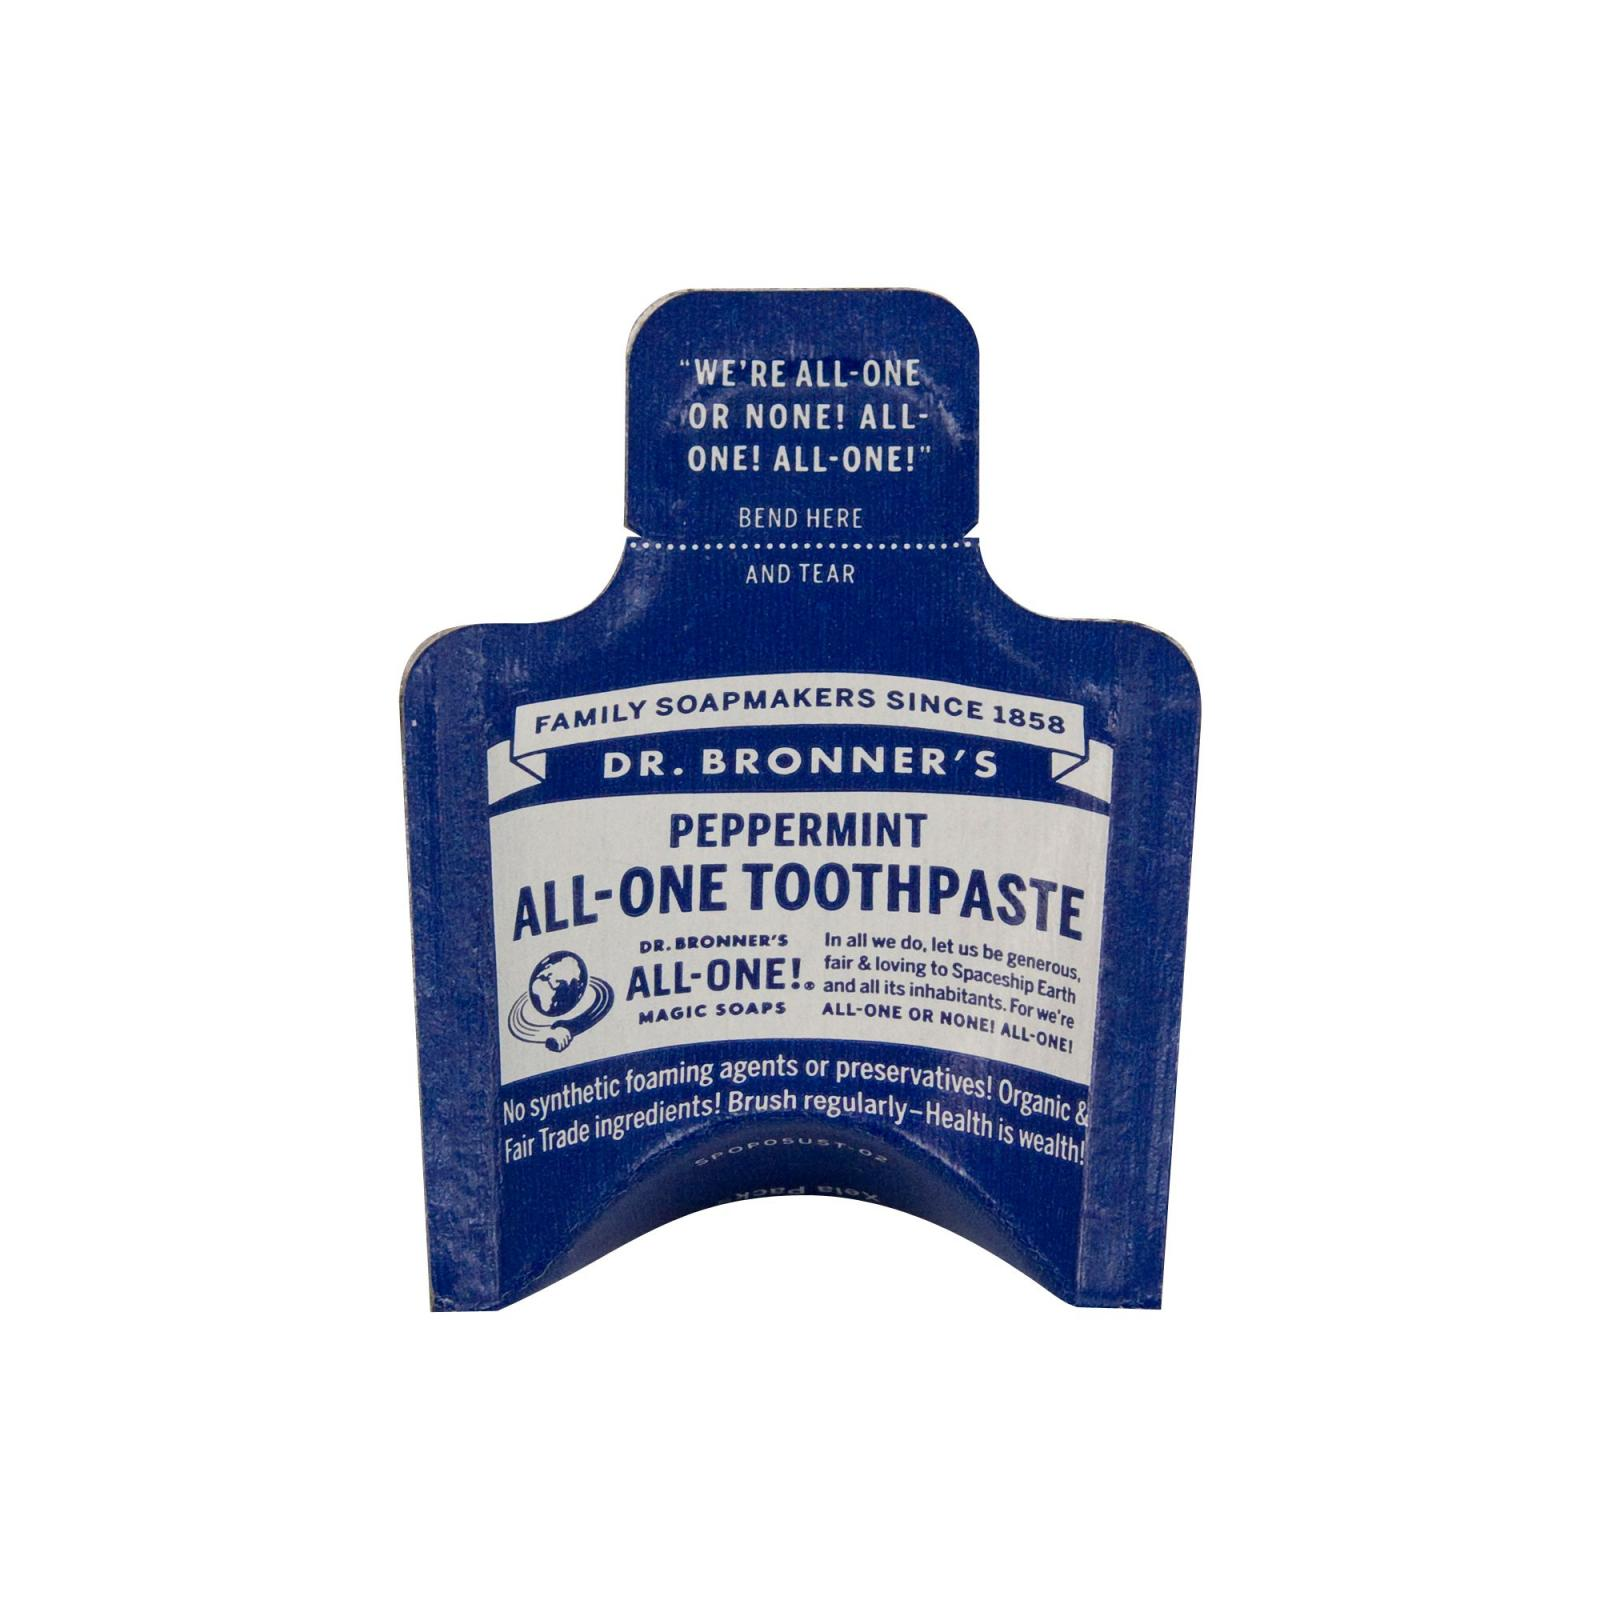 Dr. Bronner's Zubní pasta, Peppermint 5 ml